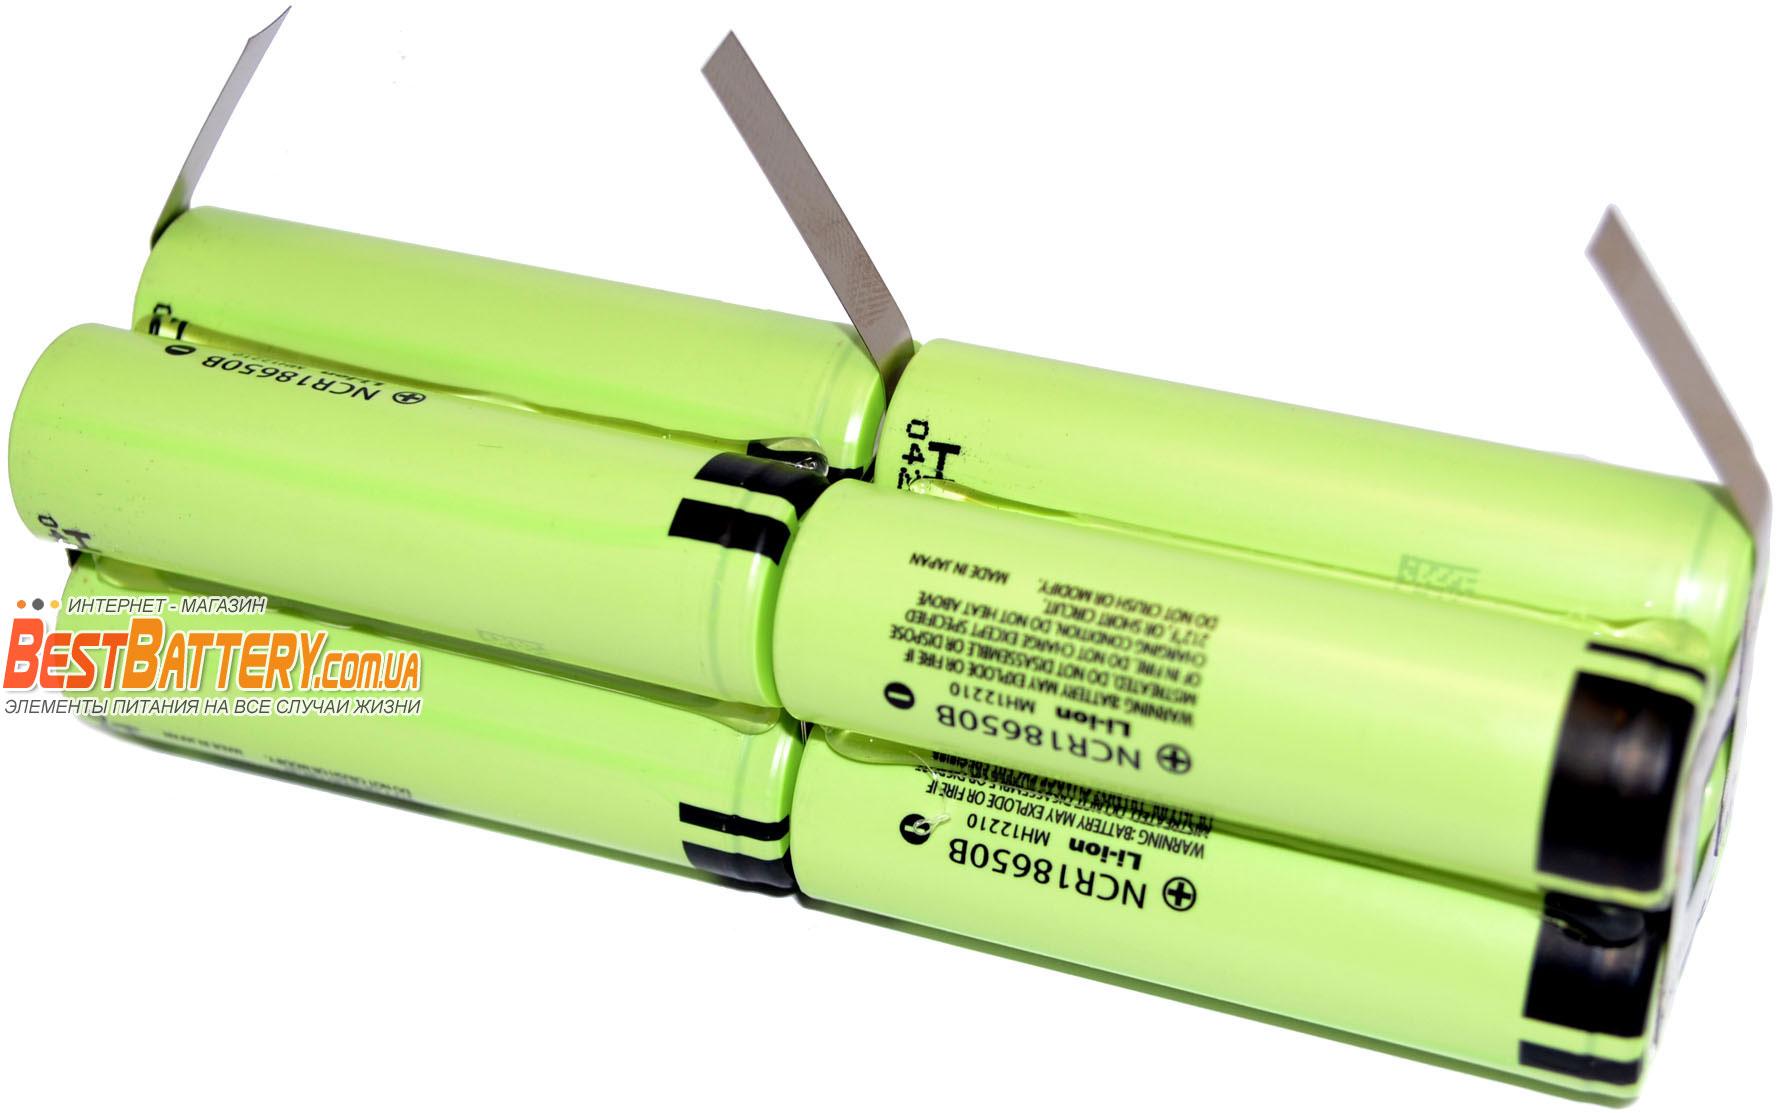 Аккумуляторная сборка для фонаря 2S4P 13 600 mAh 7,4В на базе Li-Ion 18650 Panasonic NCR18650B.